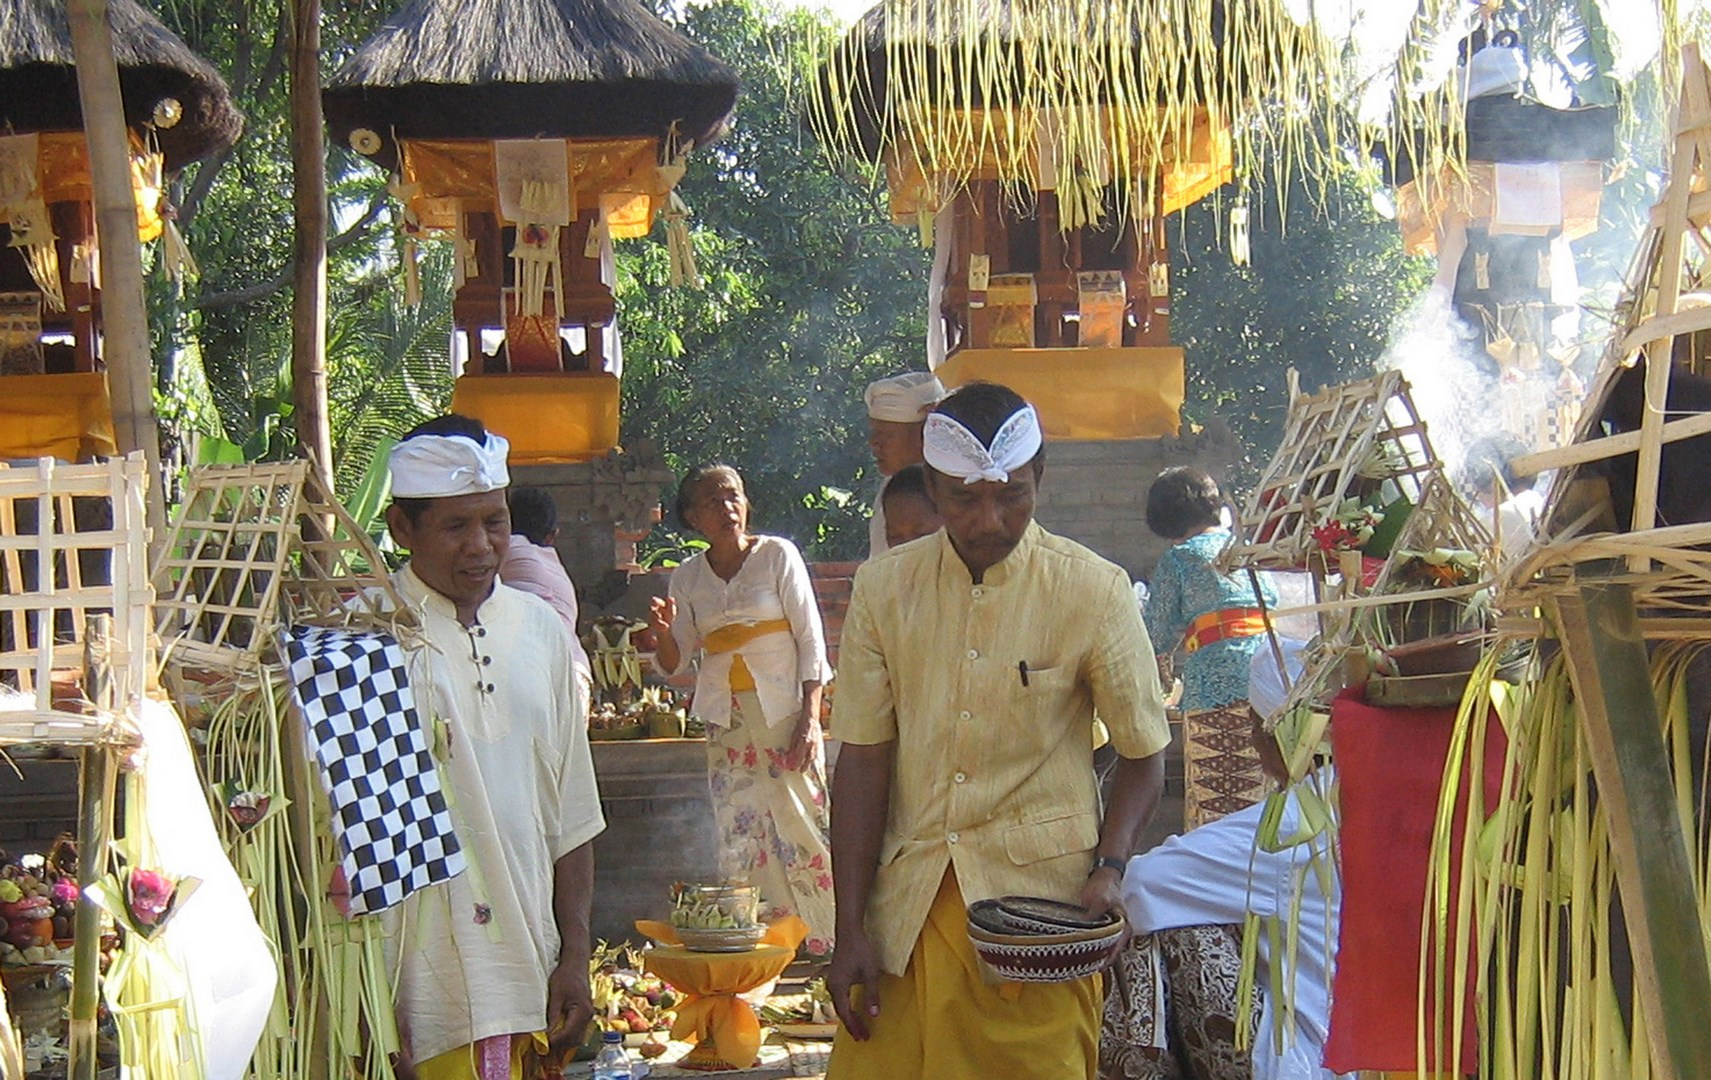 Balinesische Zeremonie